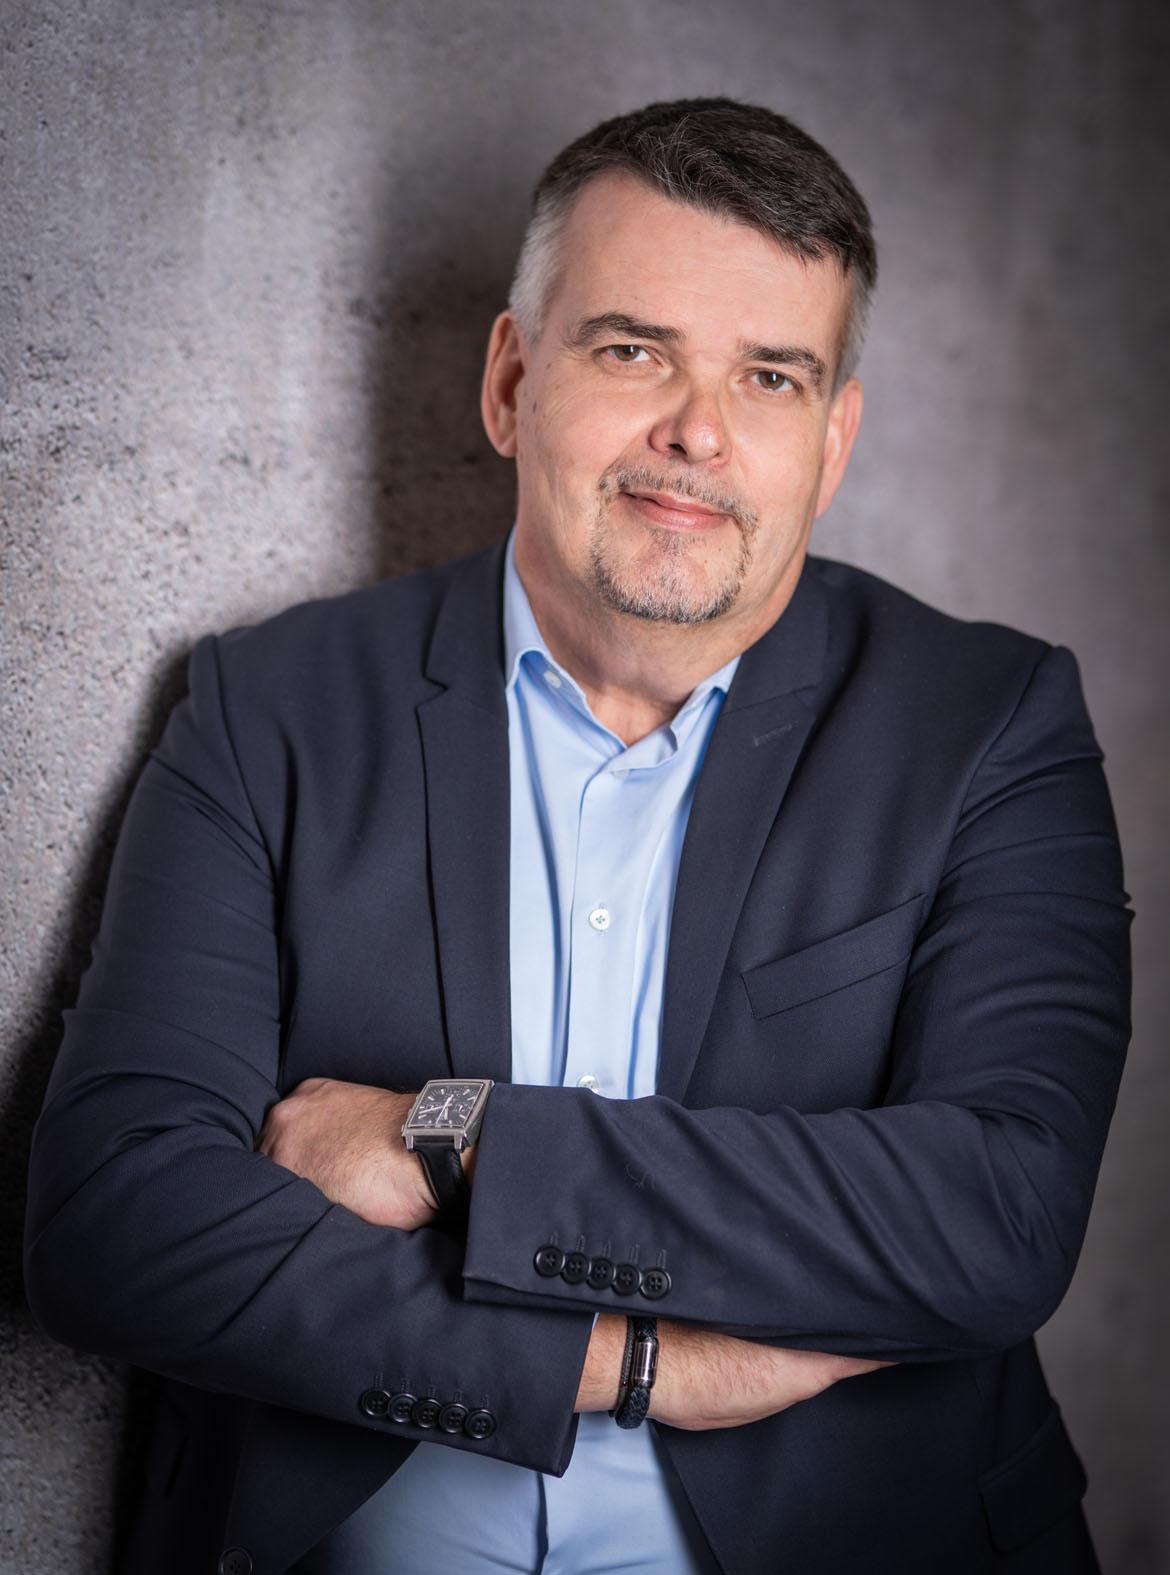 OHRpheus Inhaber Gero Fuldner Portraitbild